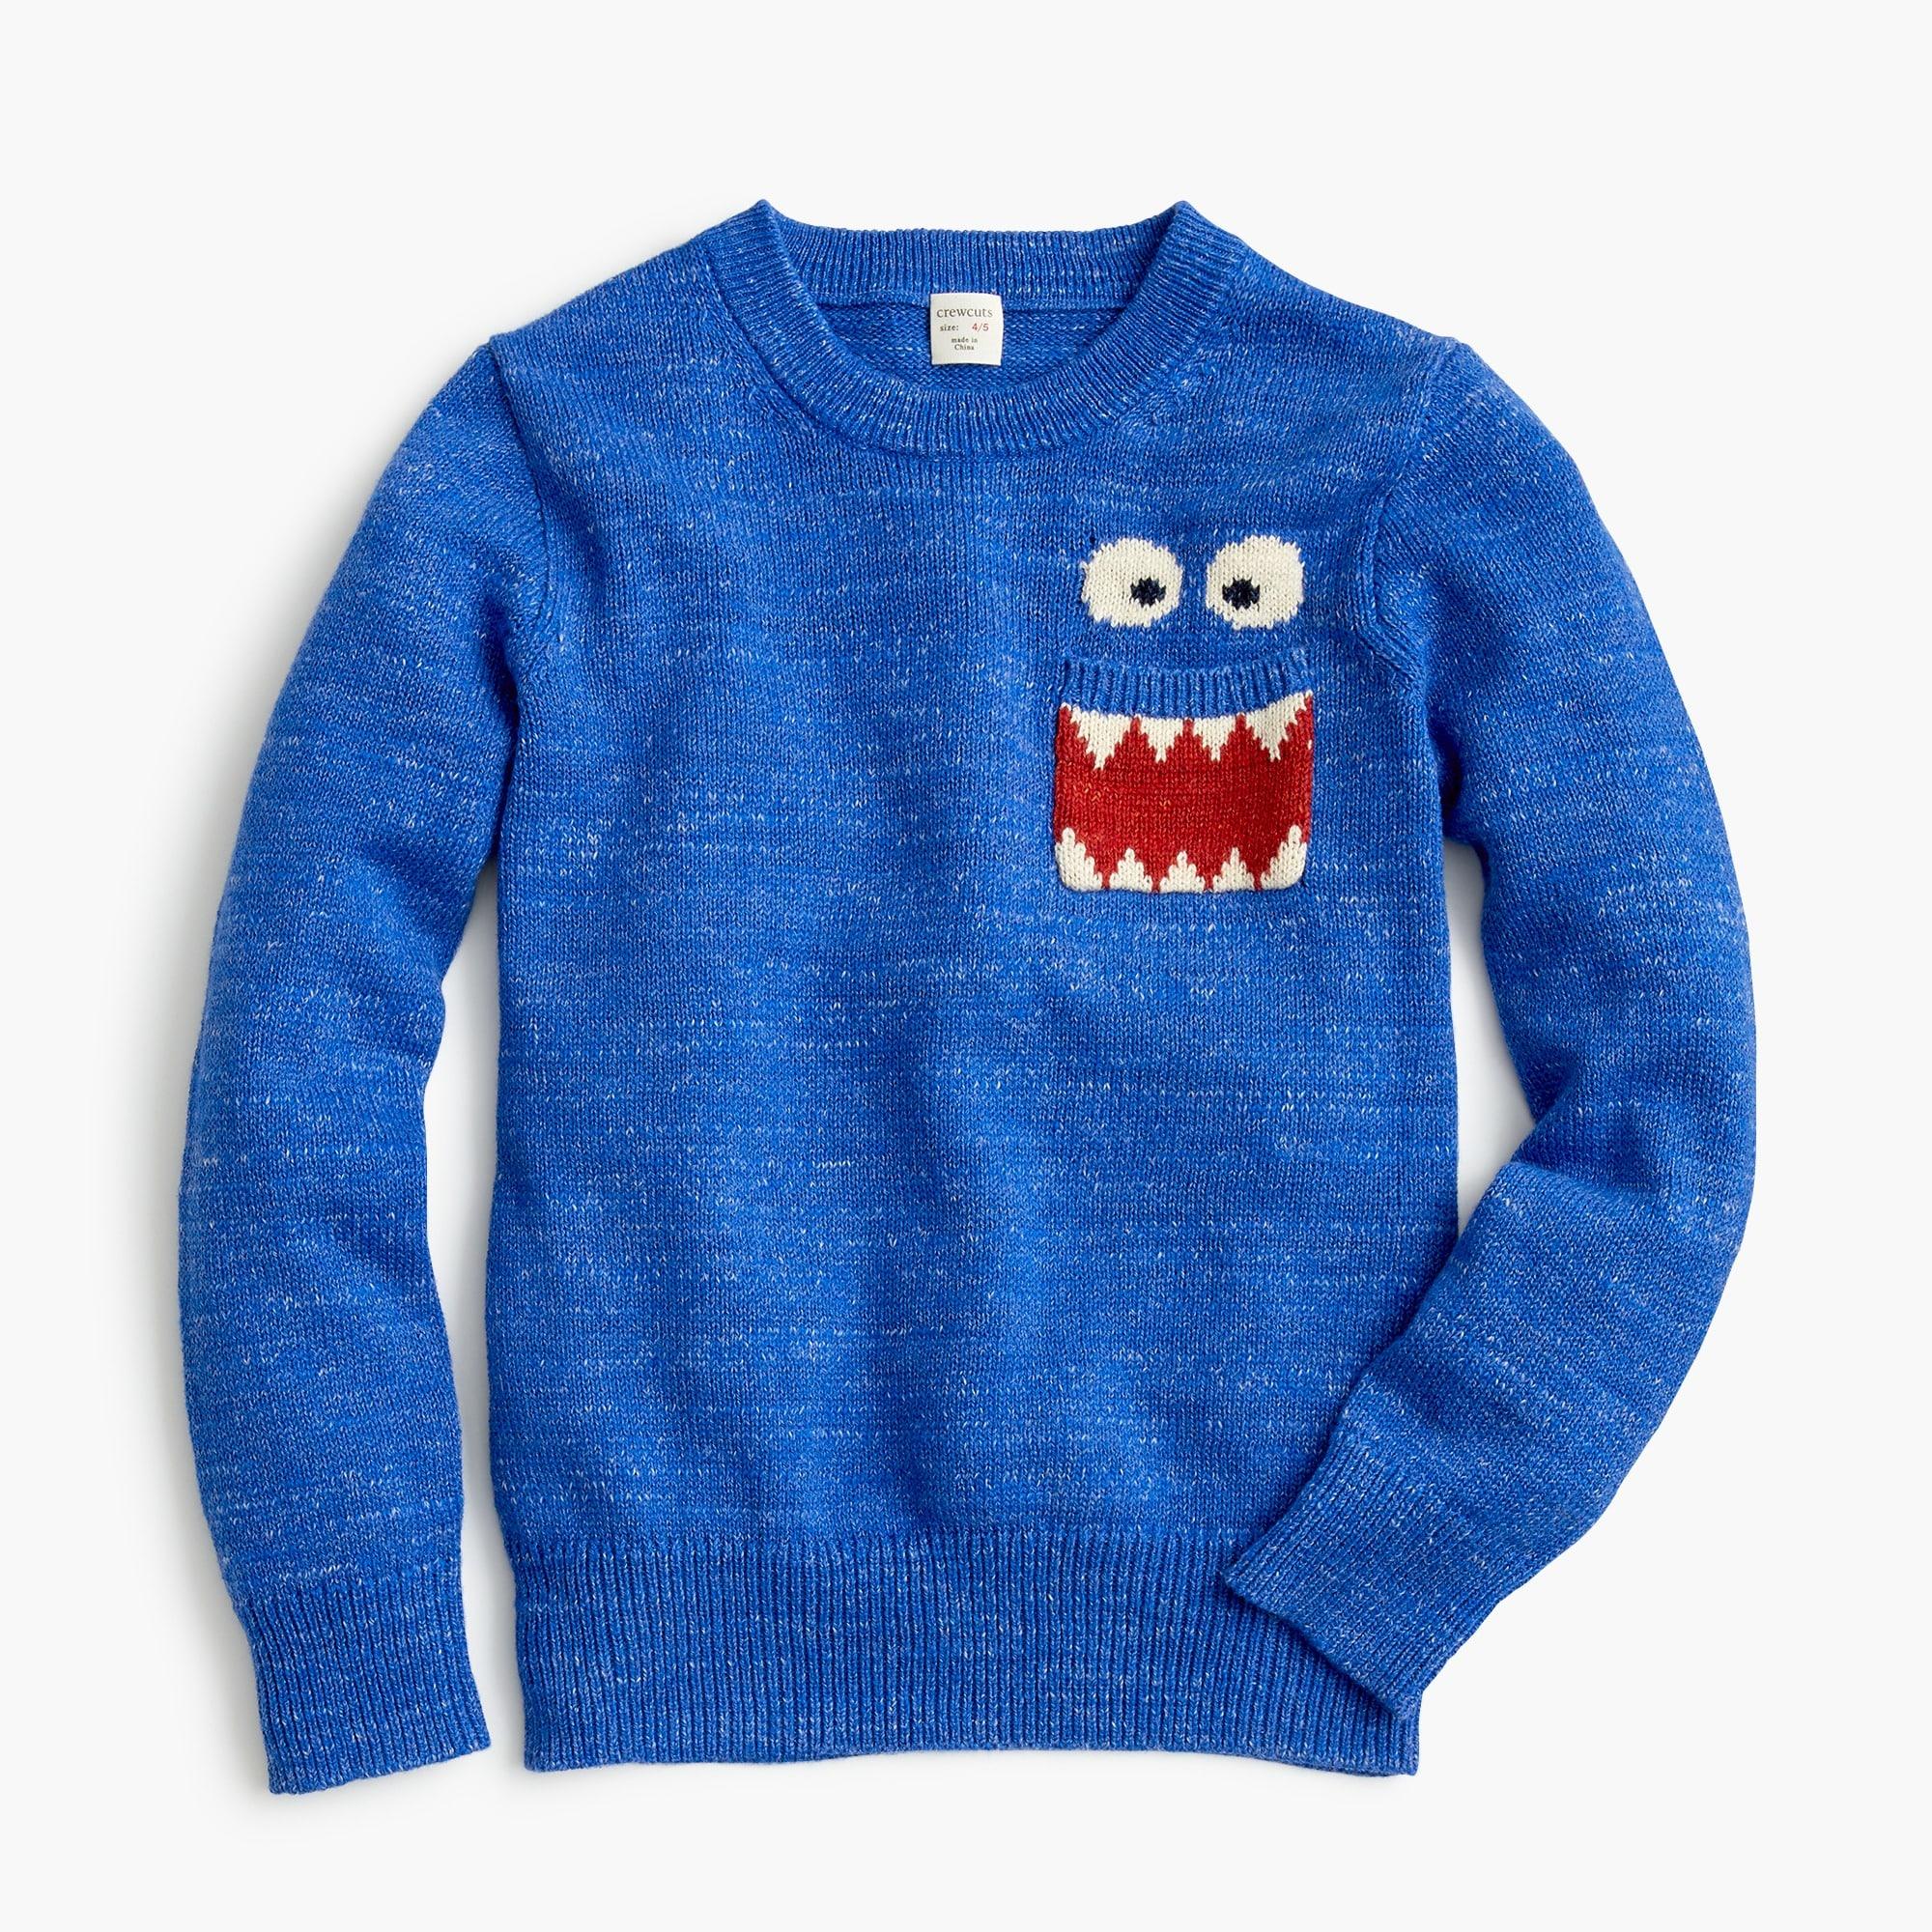 Boys' Sweaters : Crewnecks, Cardigans & More   J.Crew